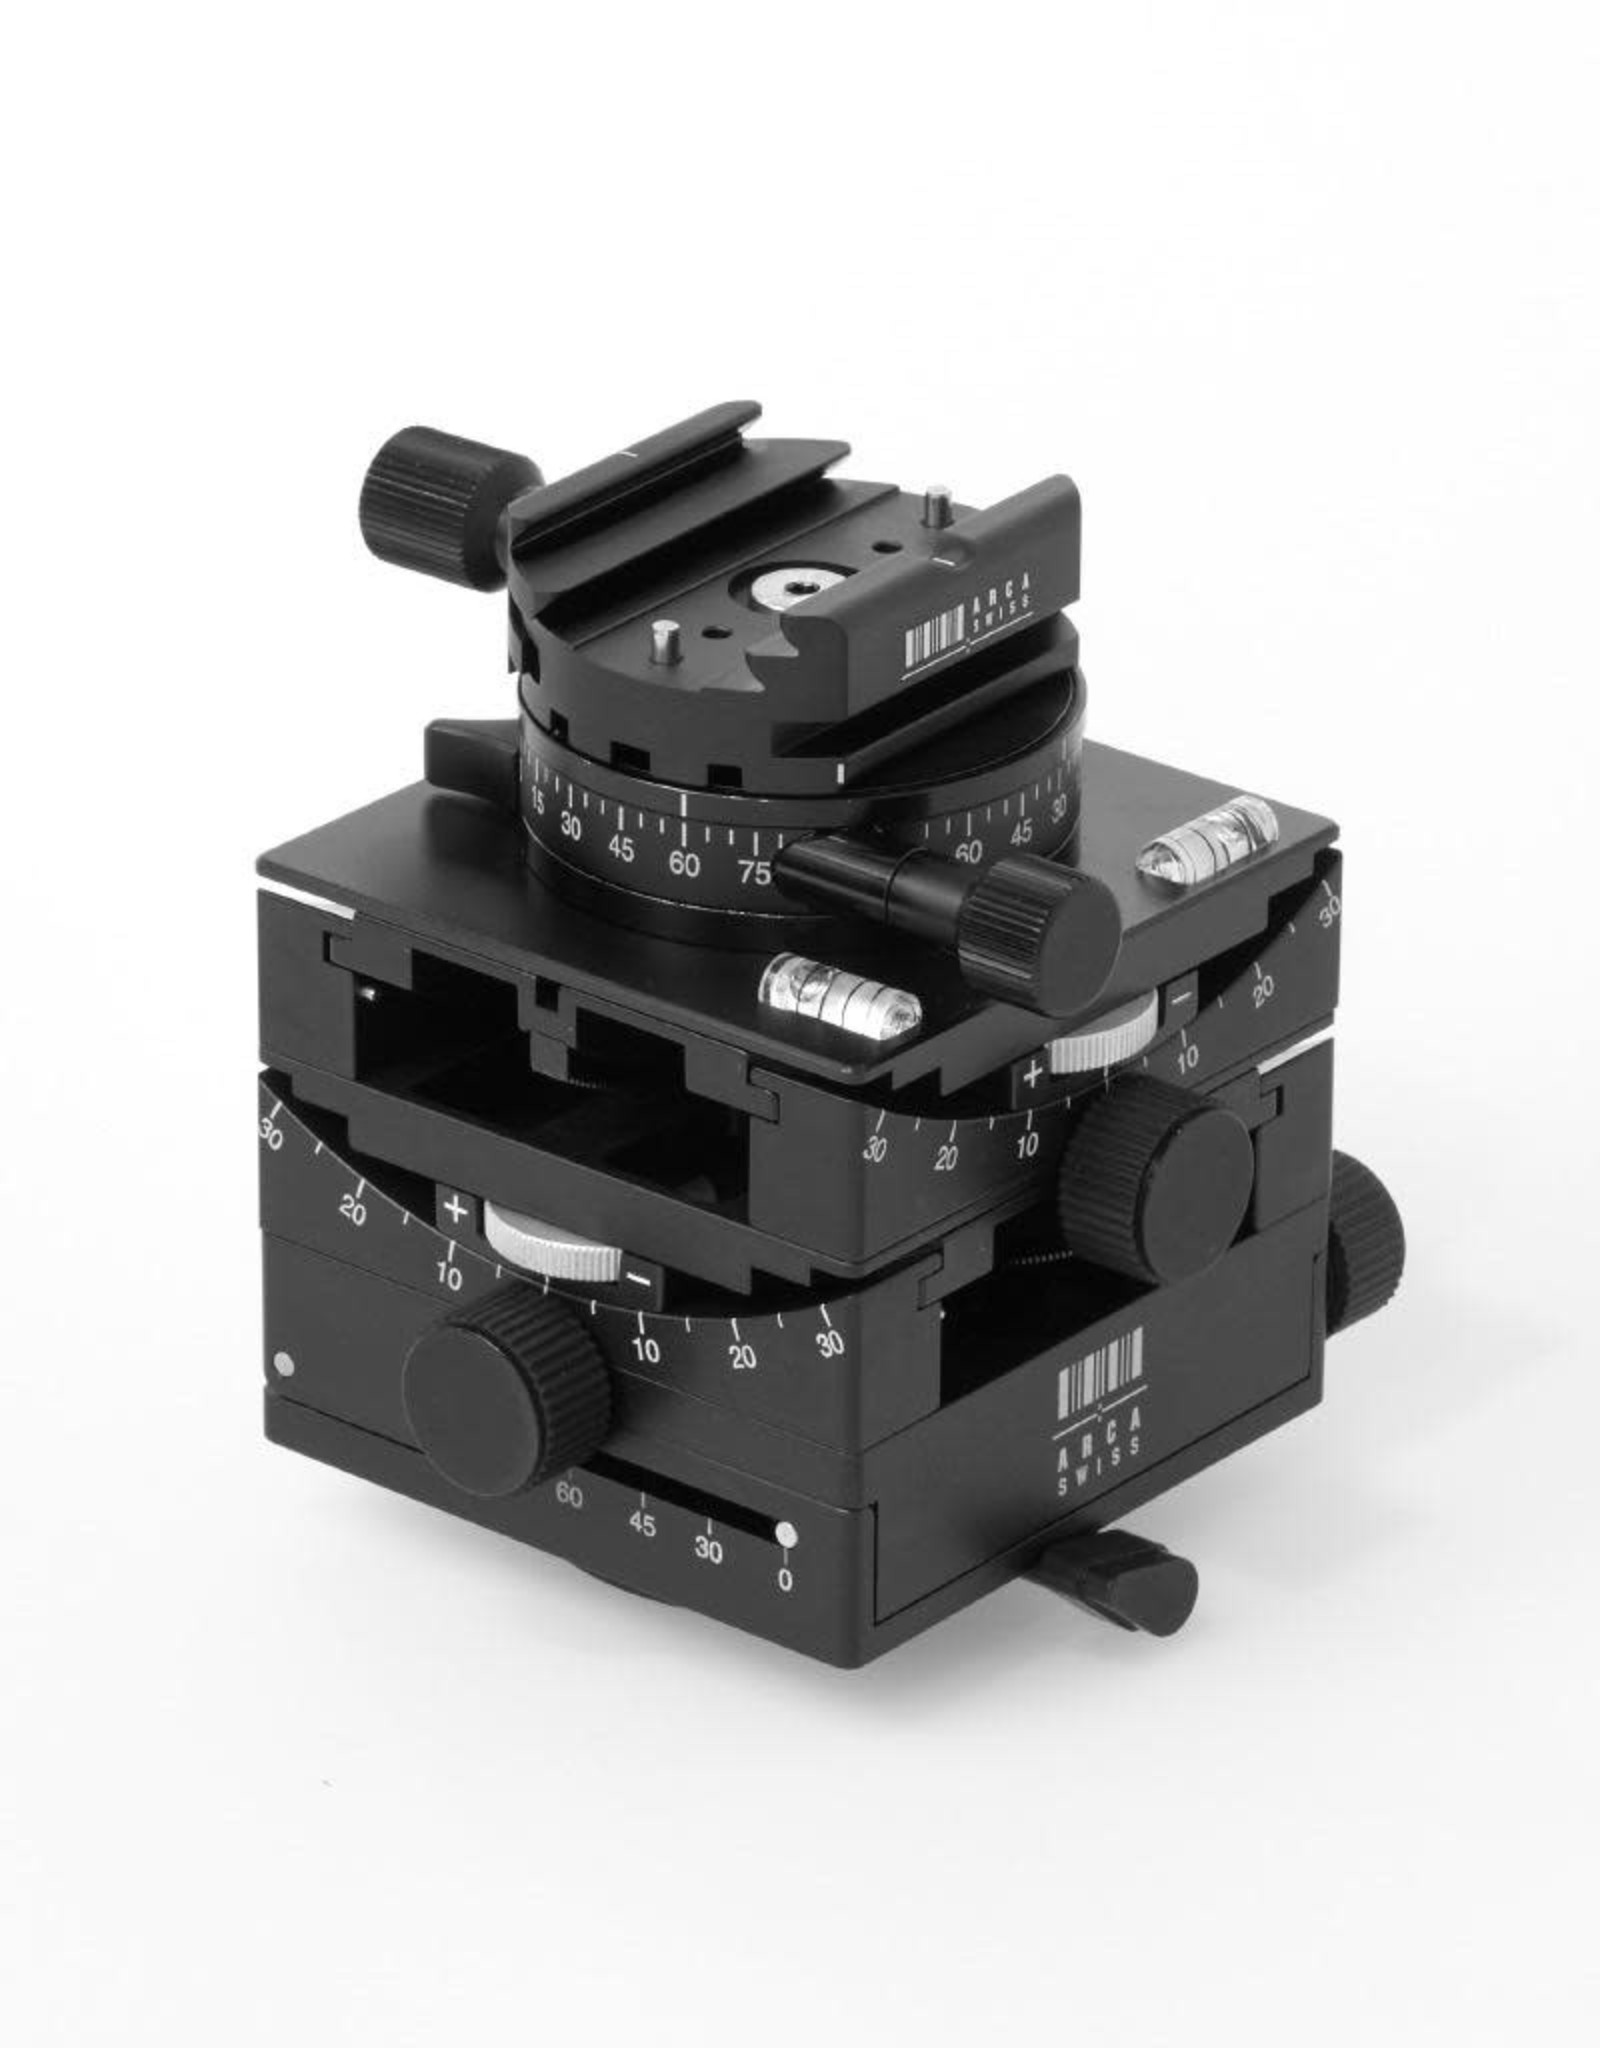 Arca Swiss ARCA-SWISS C1 cube gp (geared panning), Classic